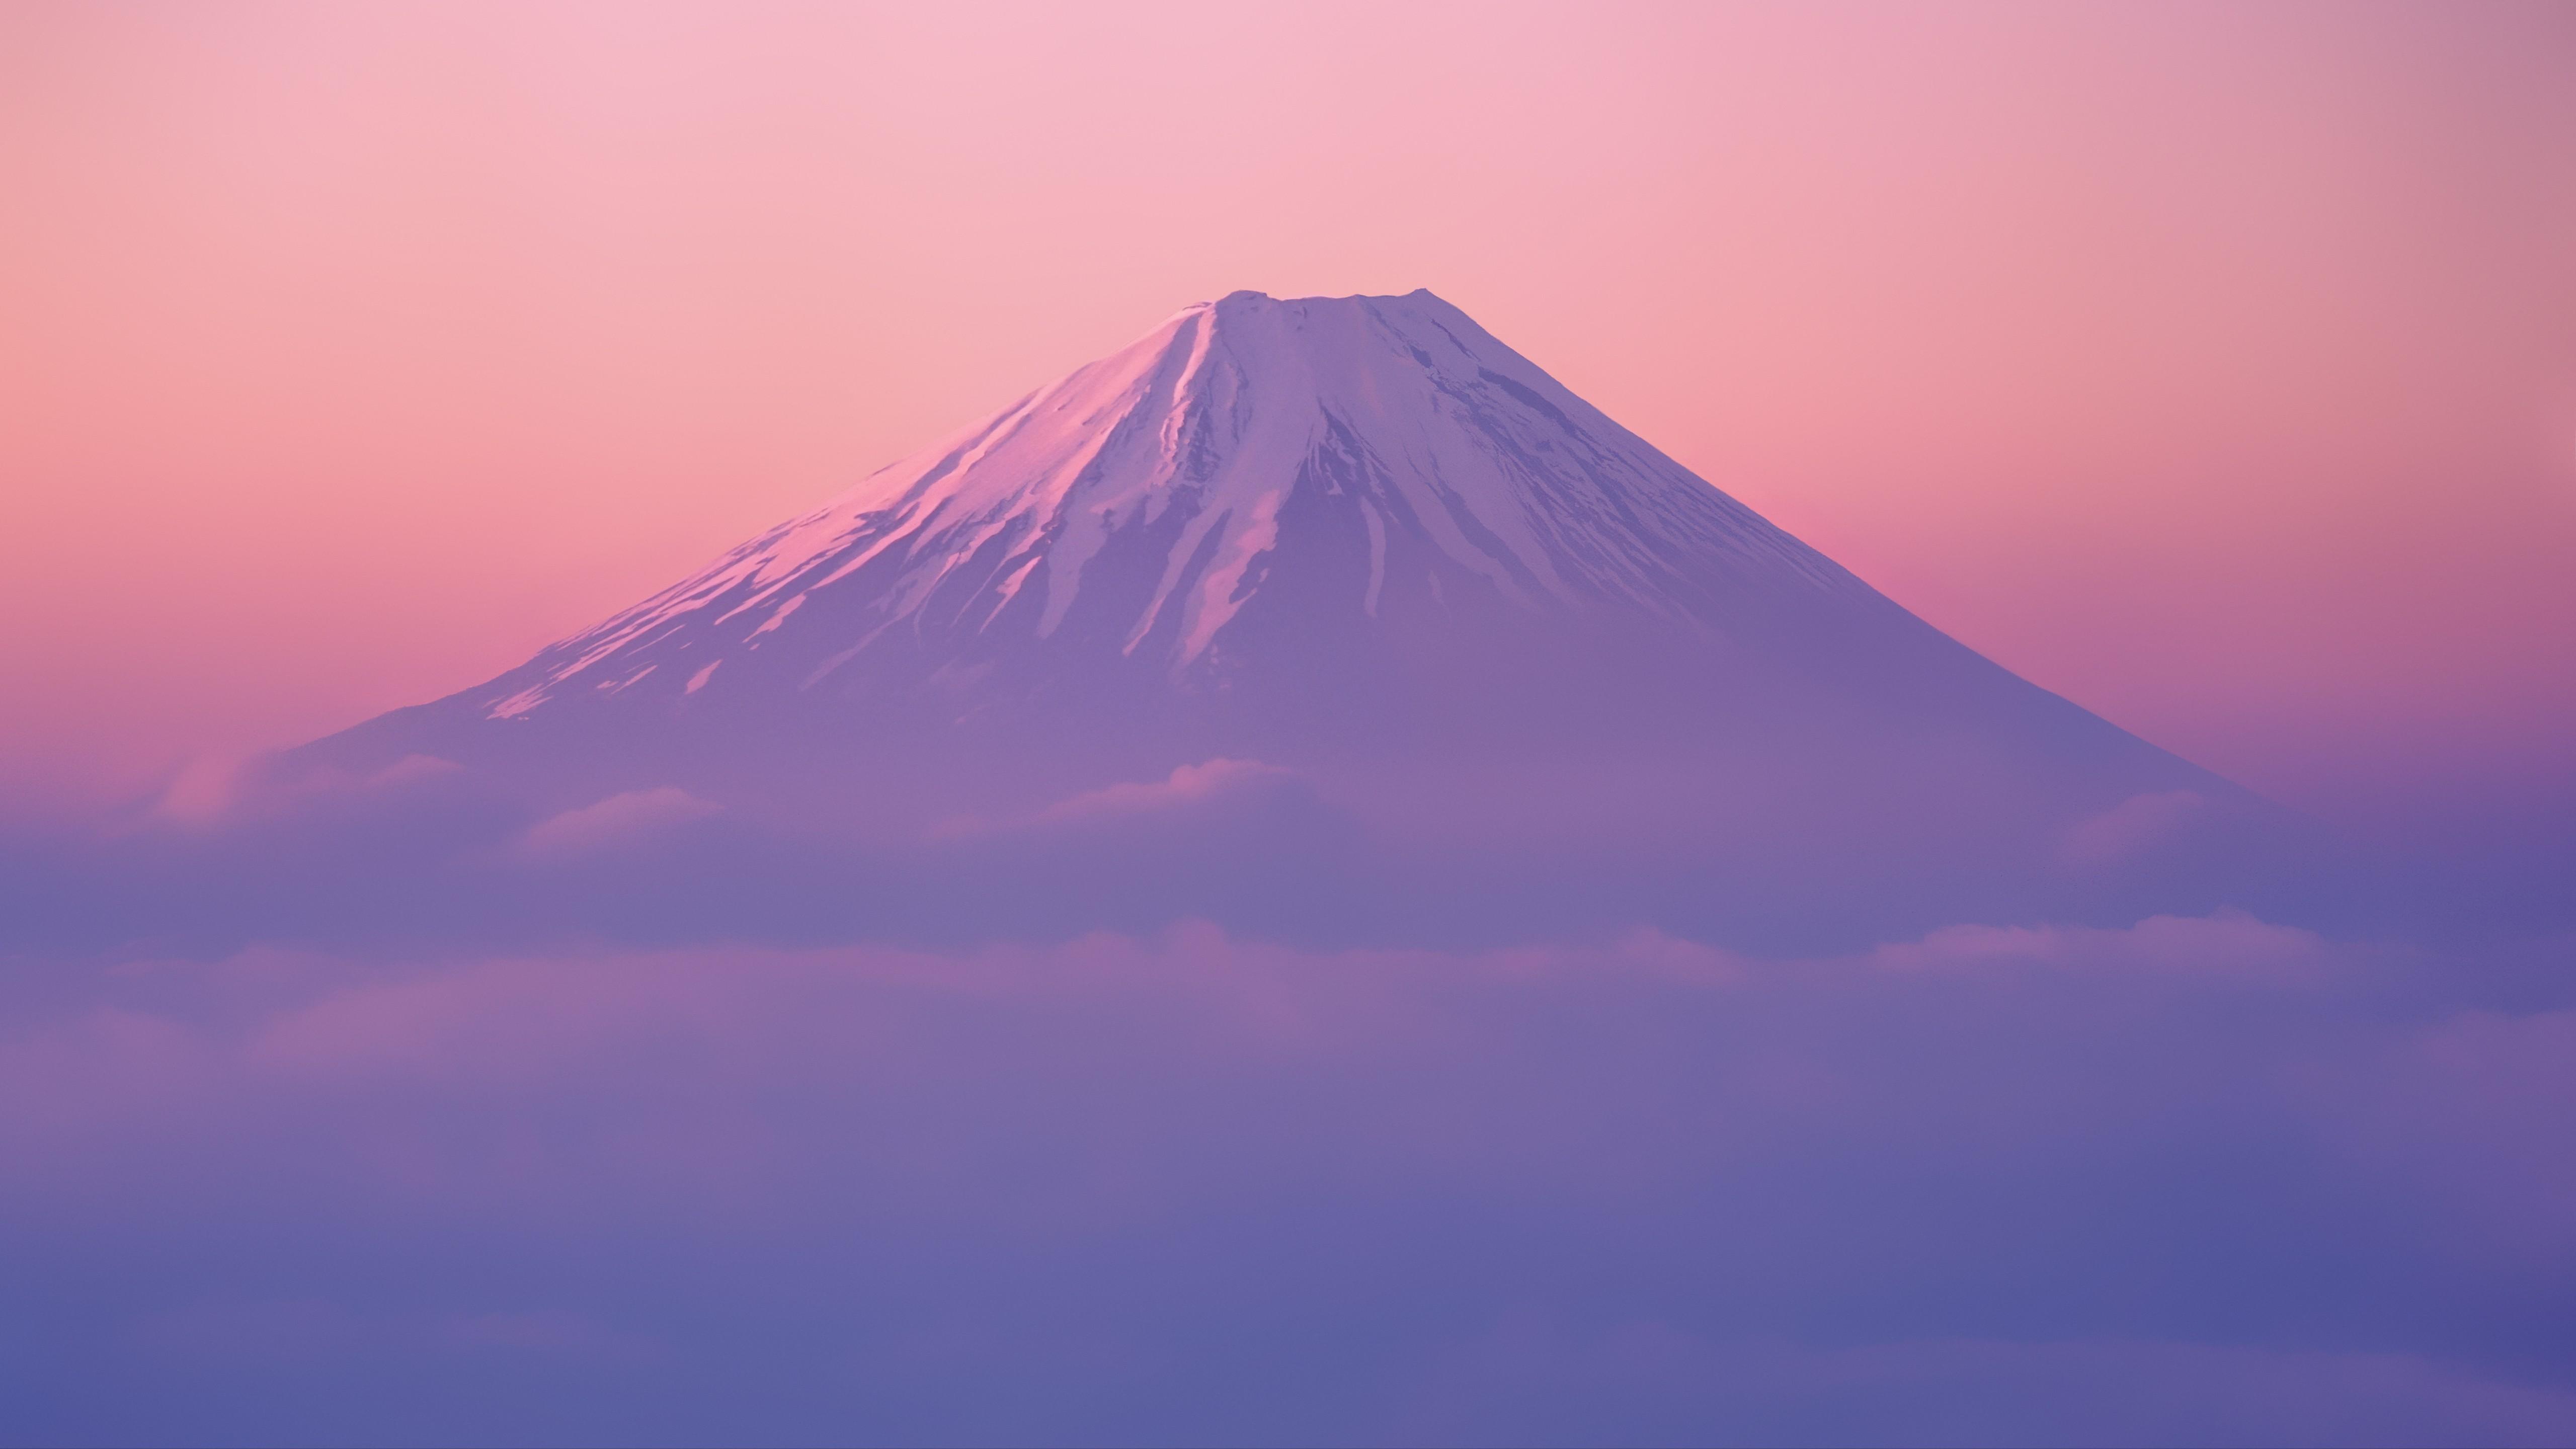 General 5120x2880 mountains landscape mist clouds Mount Fuji Japan Asia